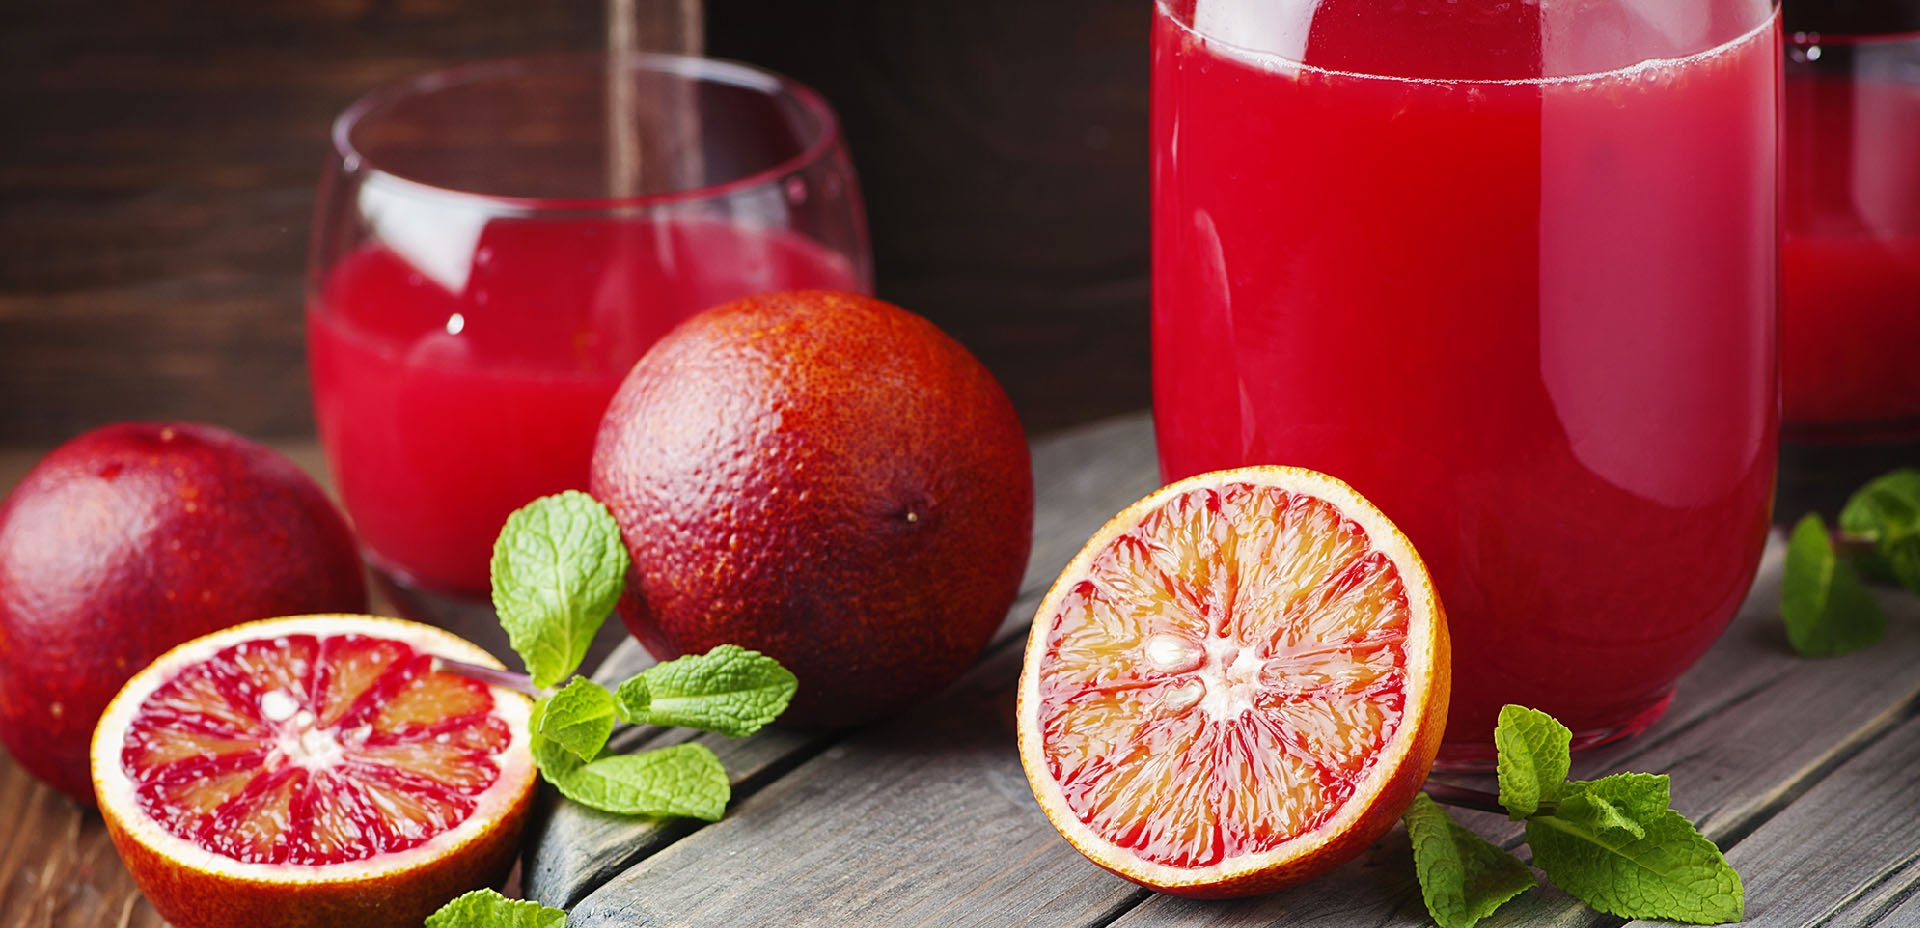 spremuta di arancia rossa